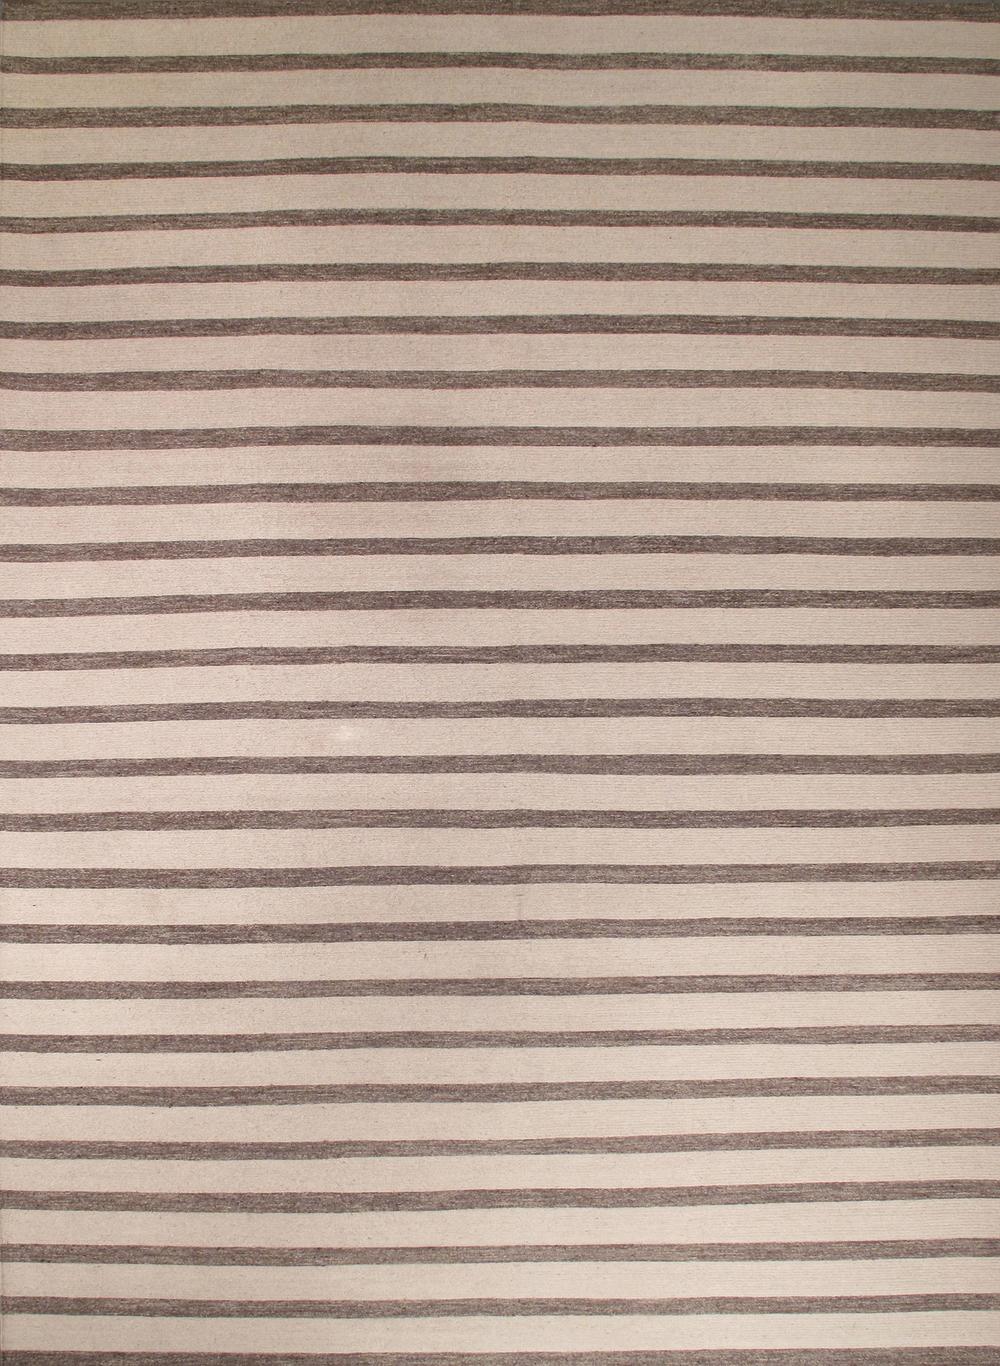 Sumak Stripes